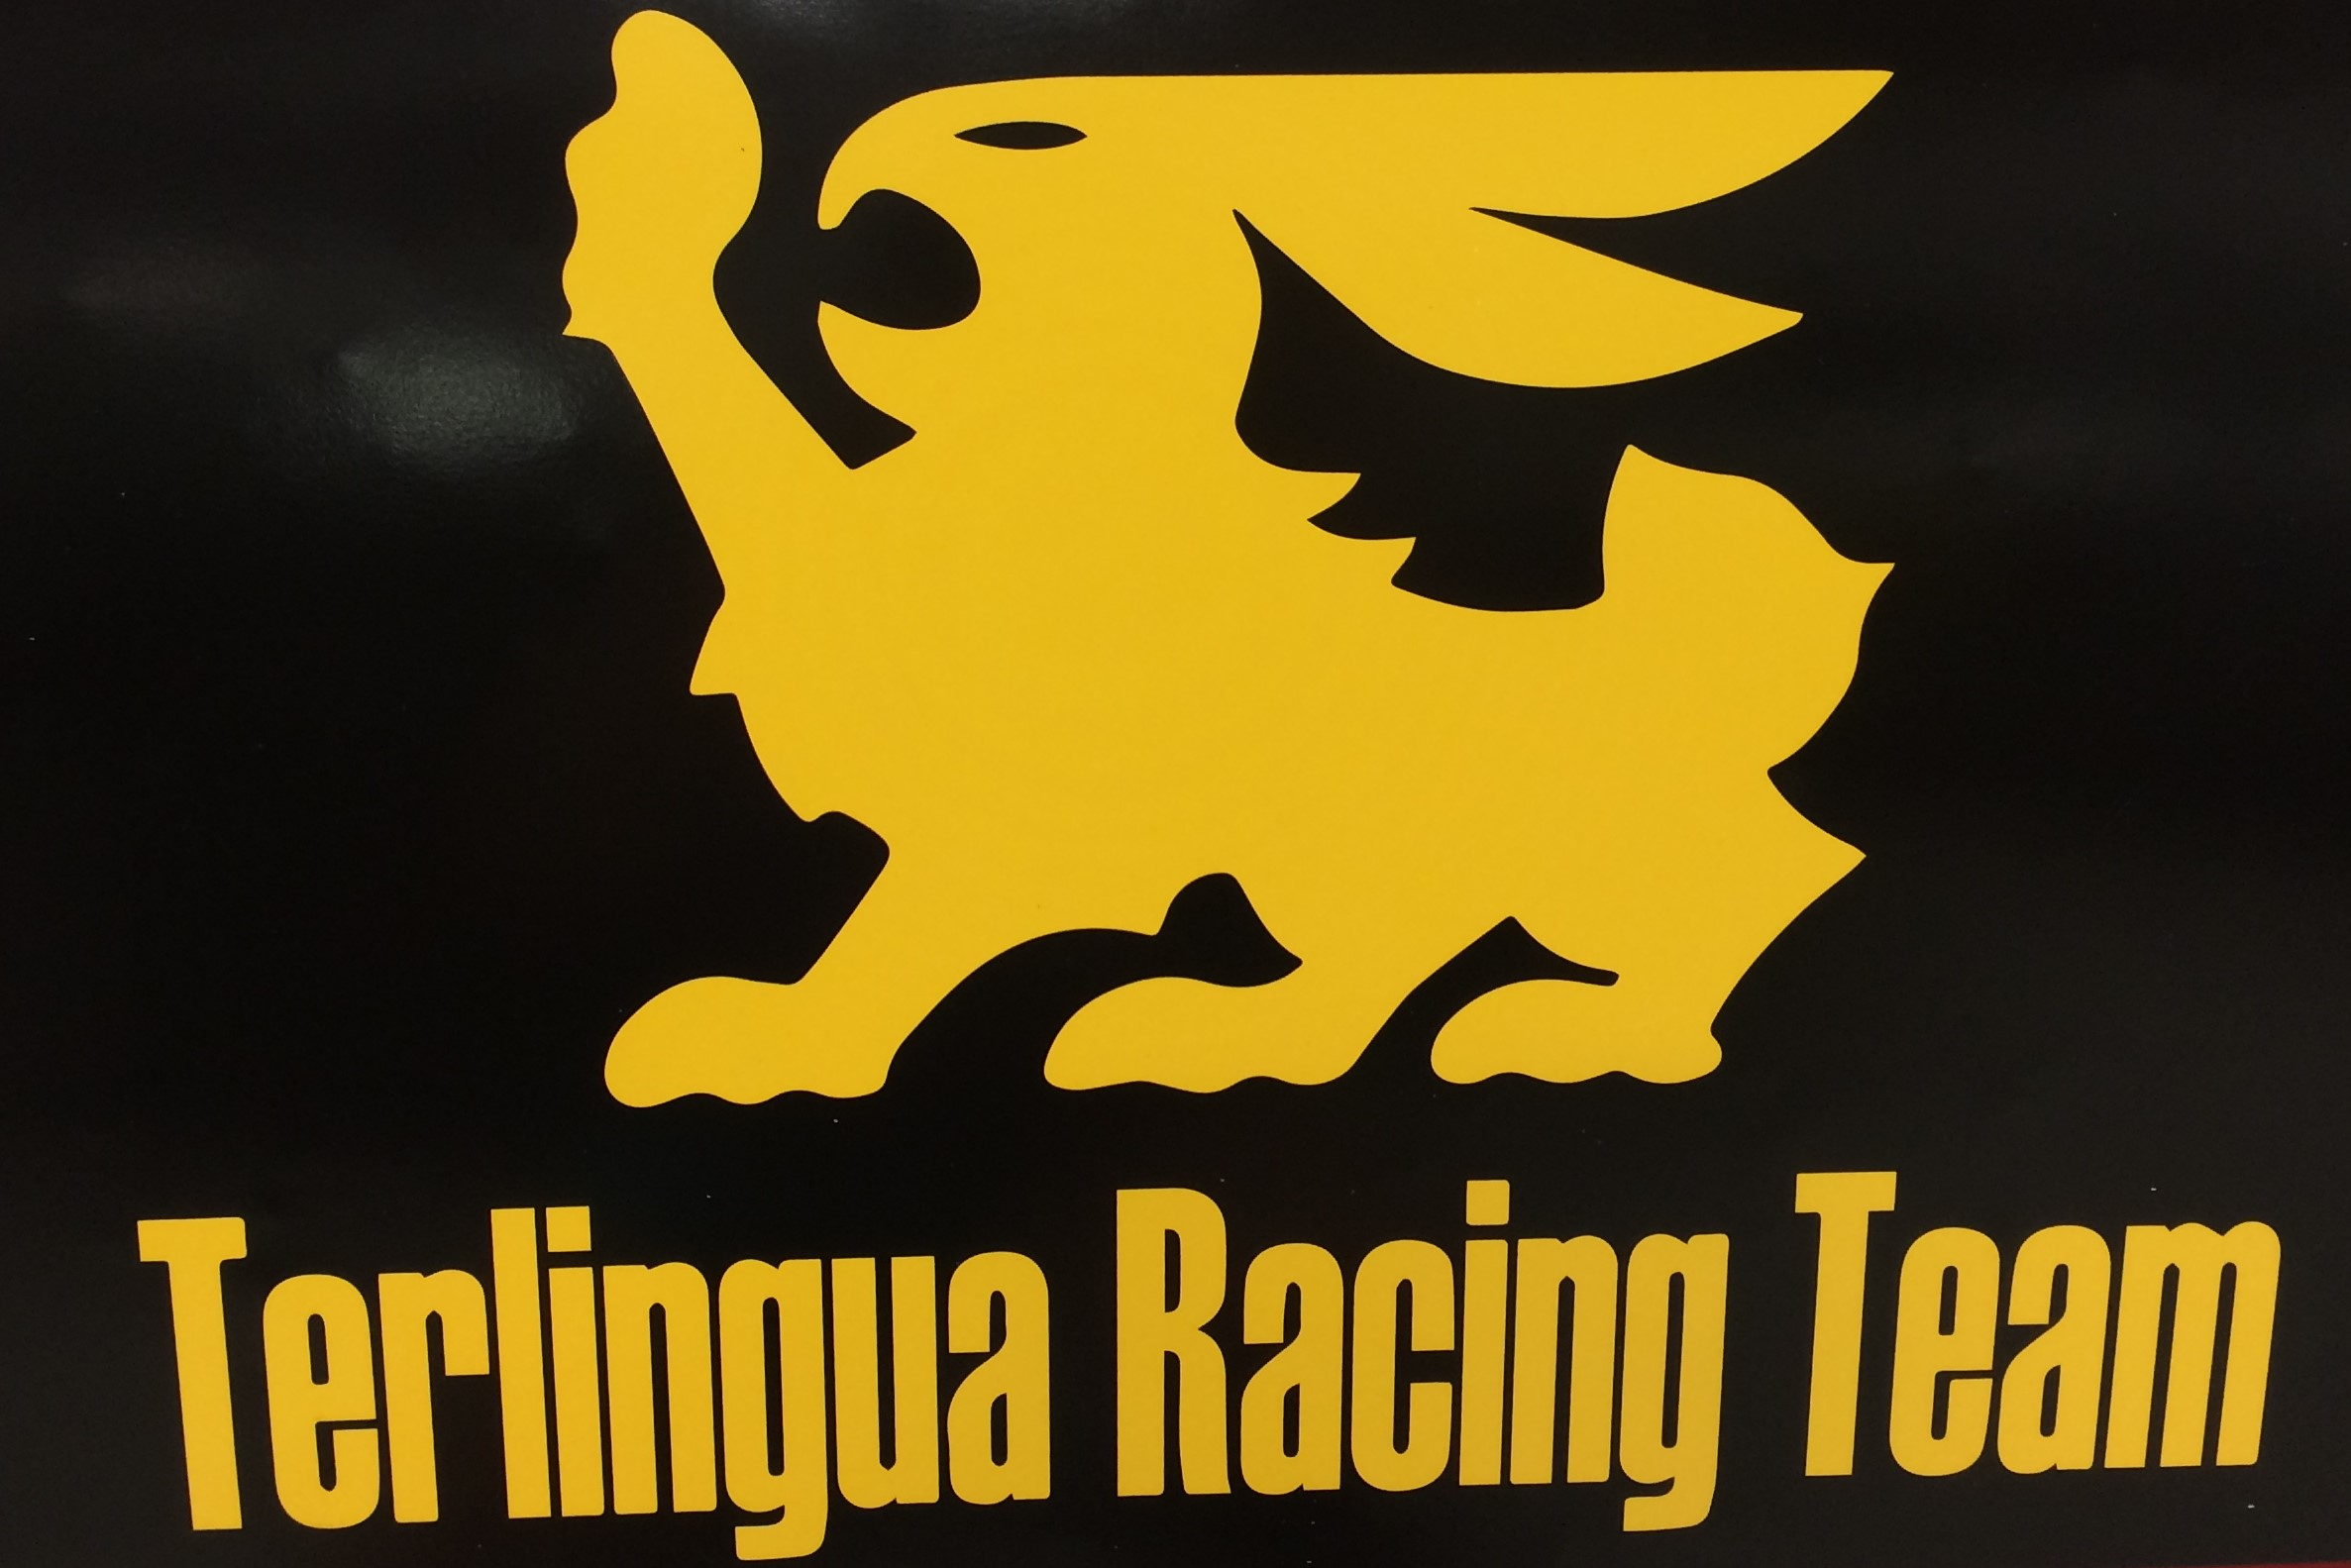 Terlingua racing team Logos